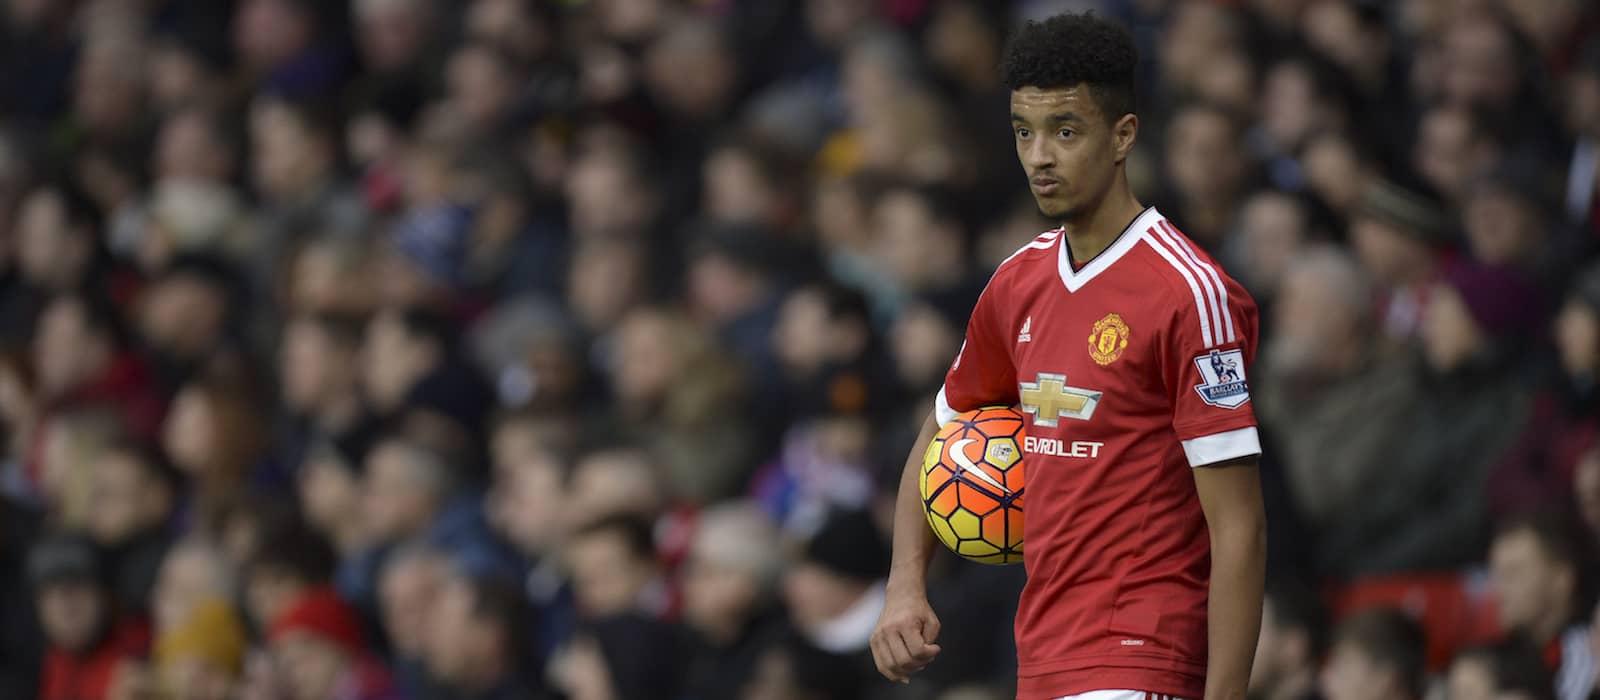 Manchester United confirm Cameron Borthwick-Jackson loan move